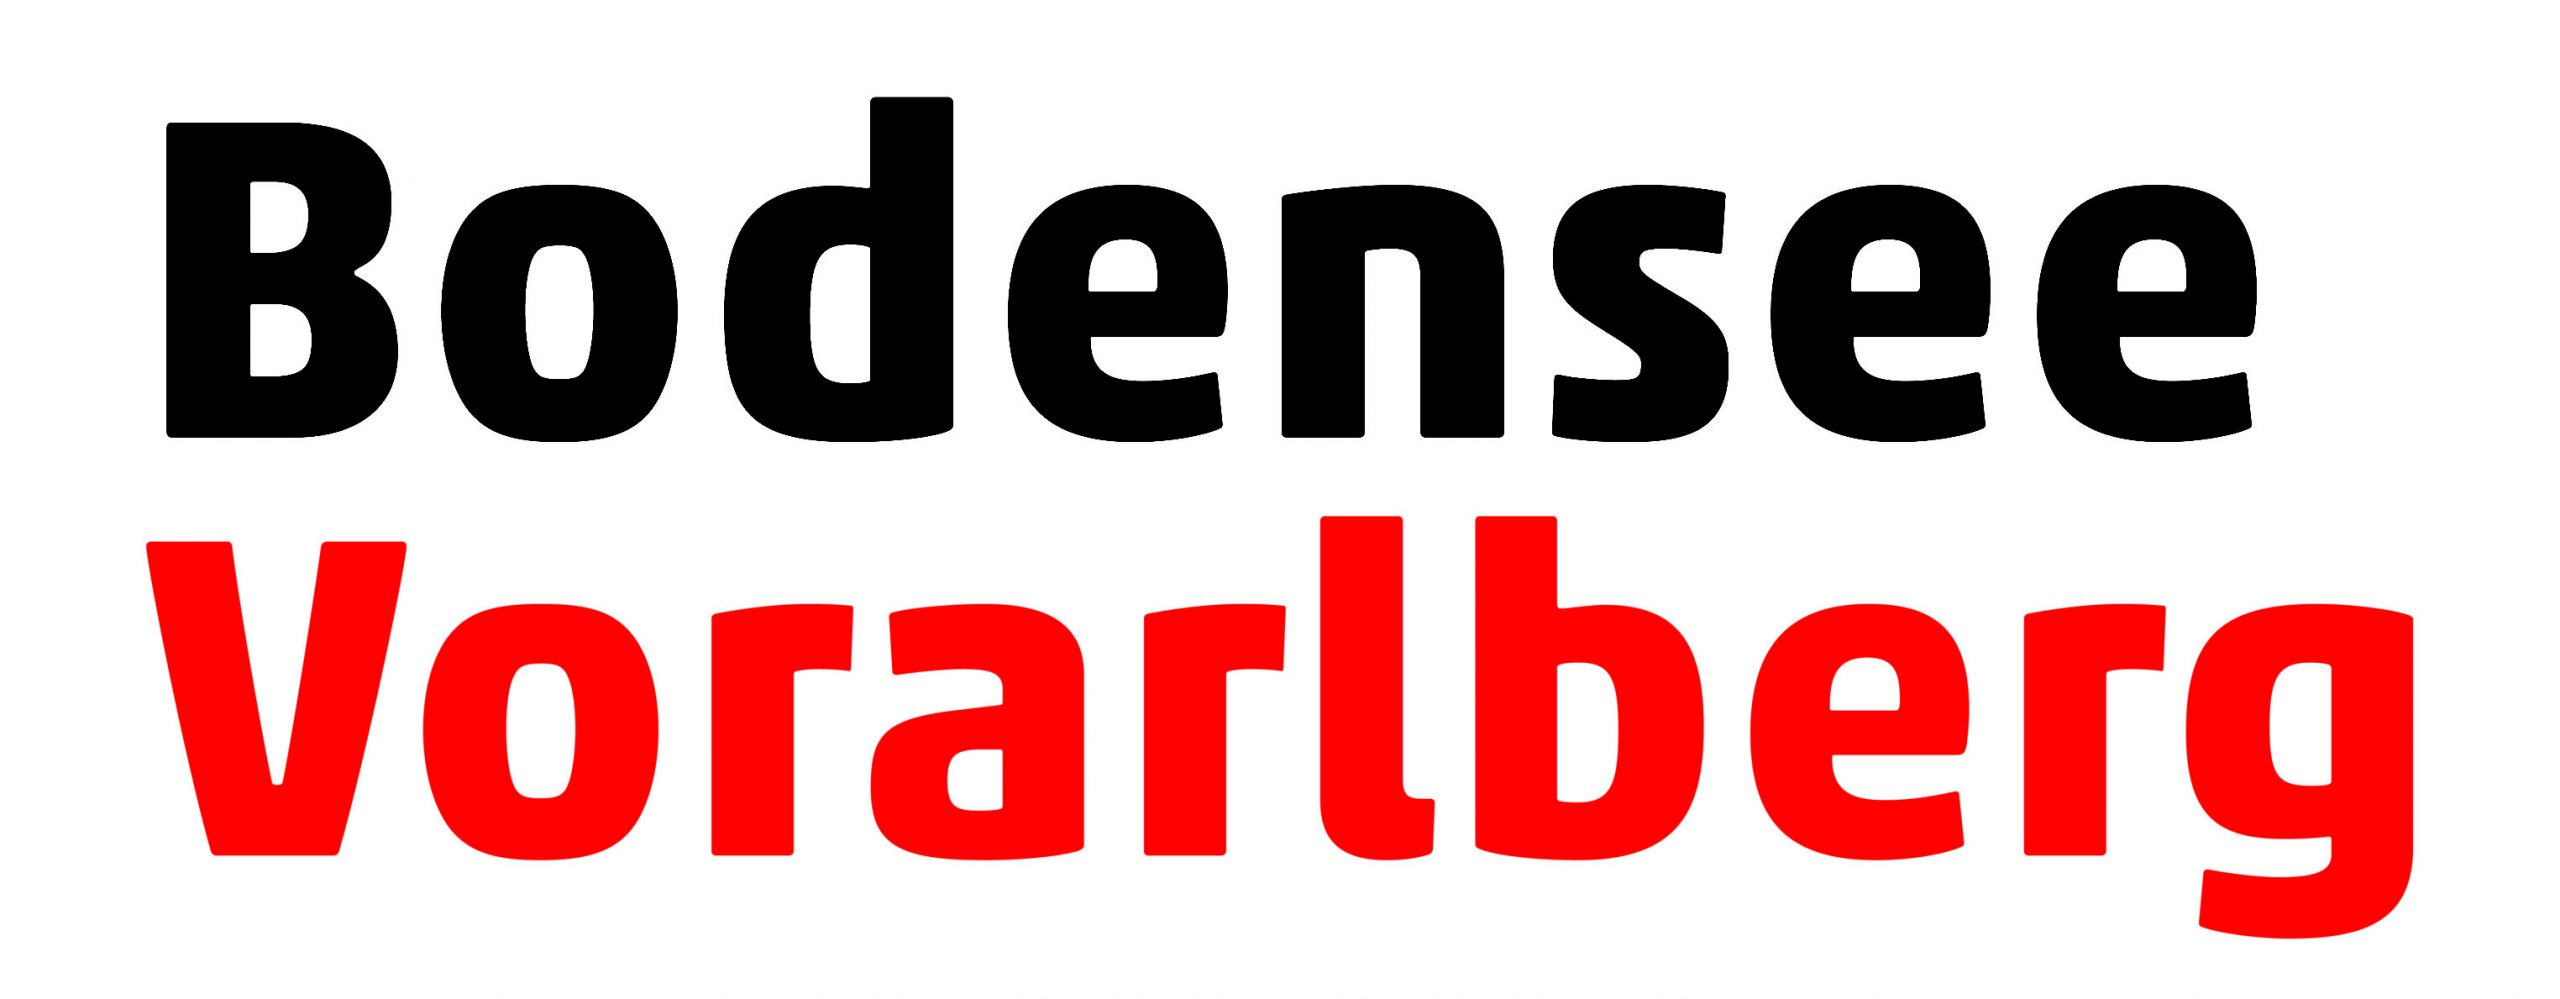 Bodensee Vorarlberg Tourismus - Logo TeamAlive // Förderer